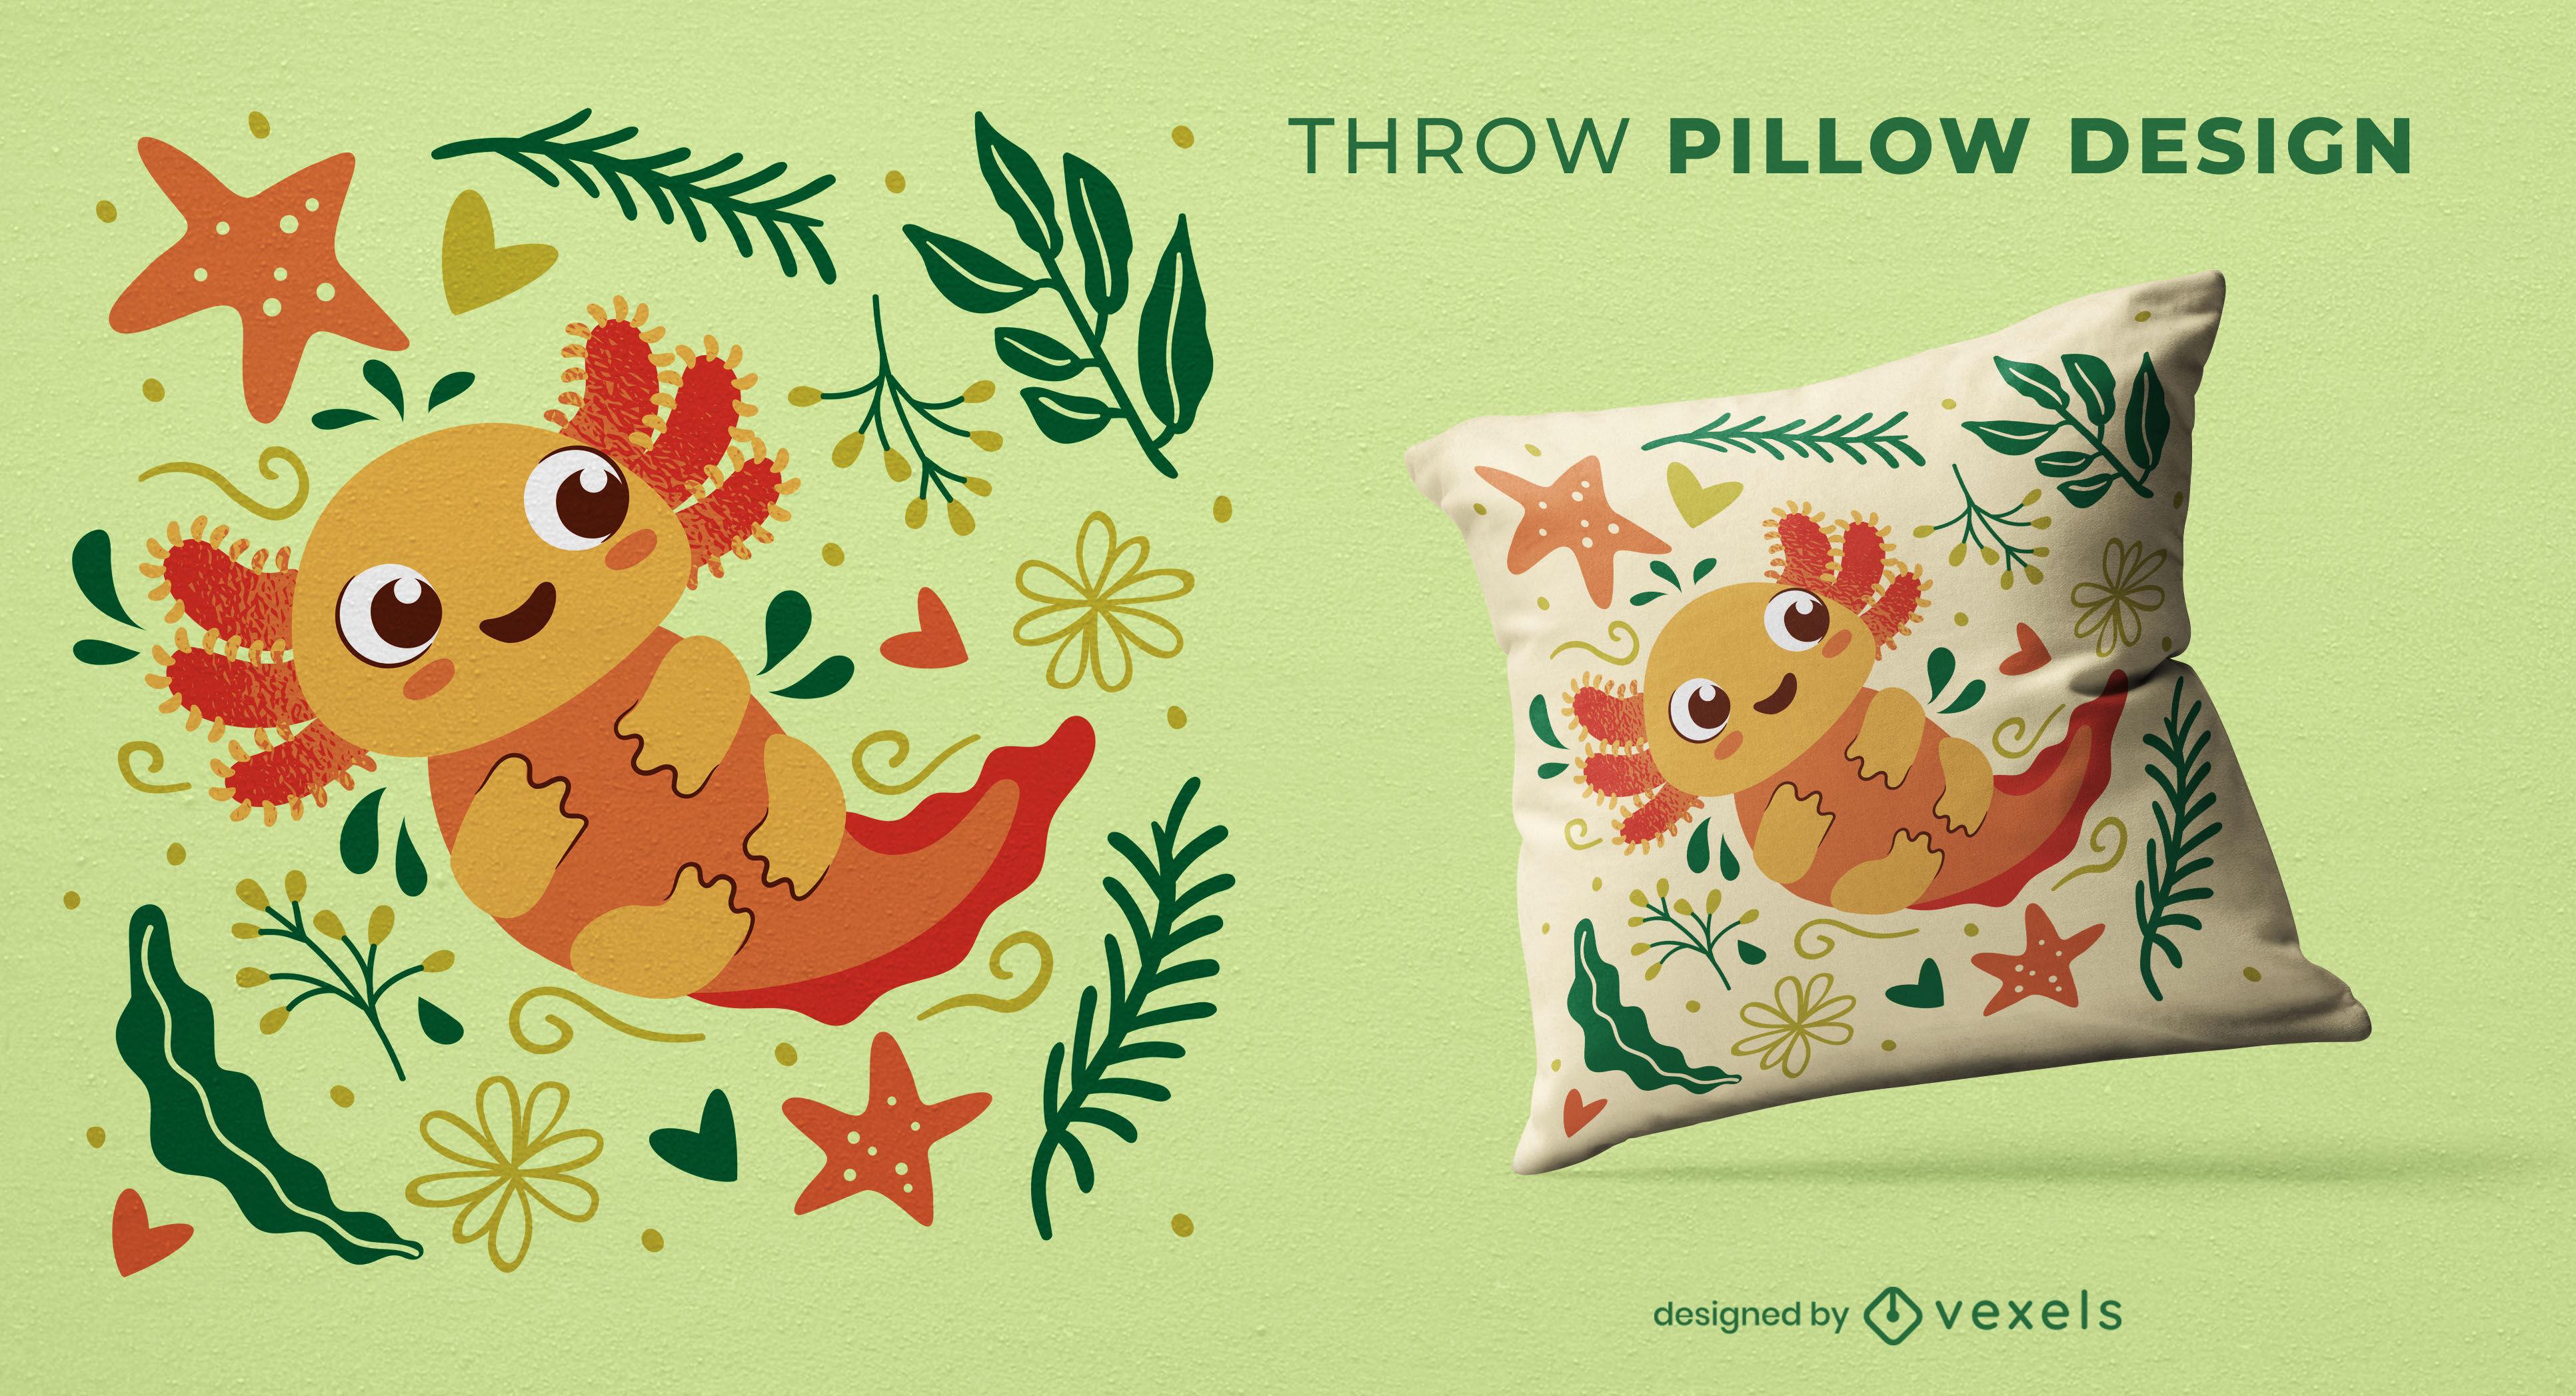 Dise?o lindo de la almohada del tiro del axolotl del beb?